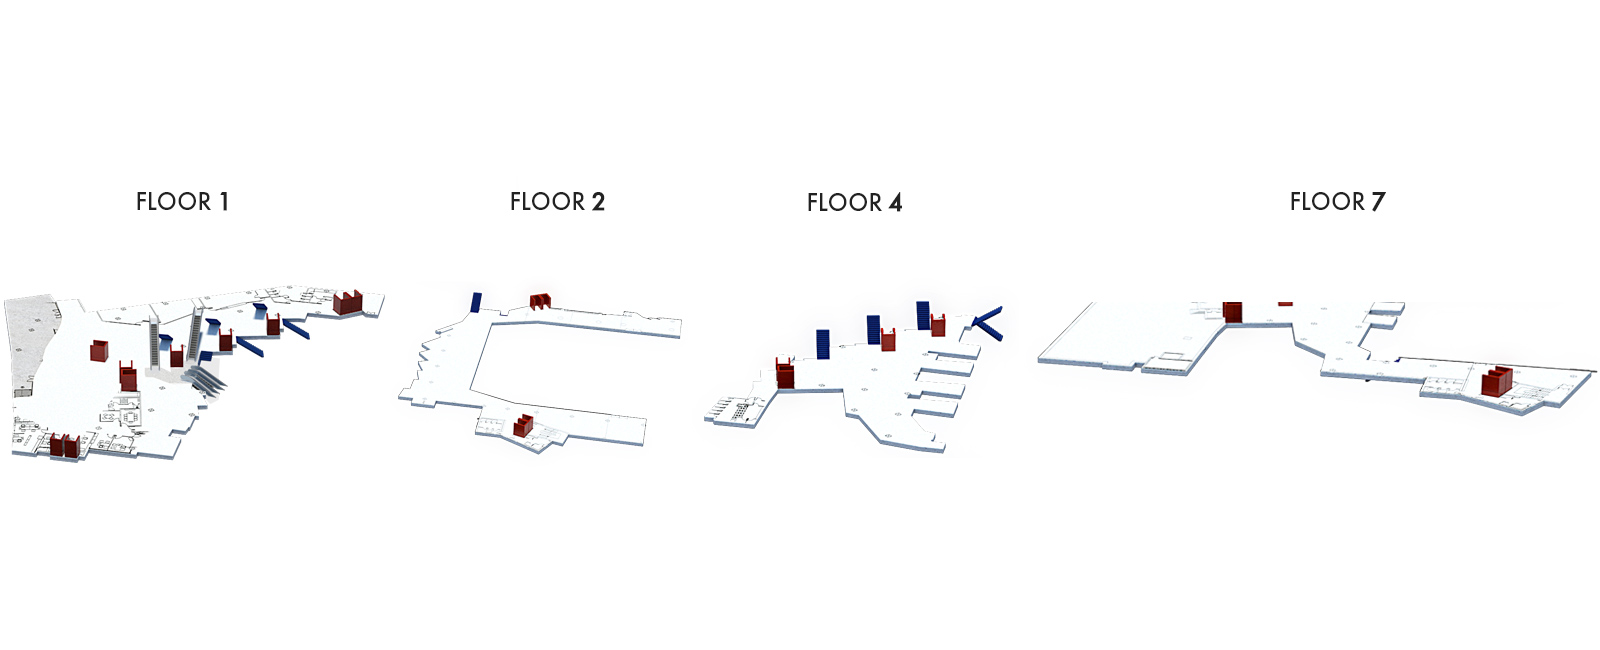 Foyers and Hall 1 Office, Floors 1, 2, 4 and 7 | Palacio Euskalduna Jauregia